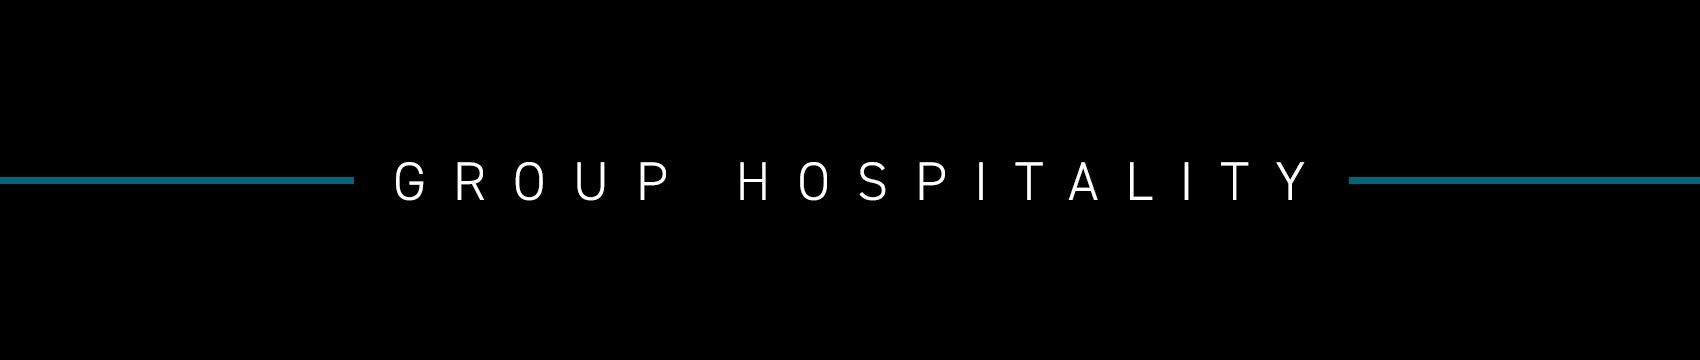 Group Hospitality-header